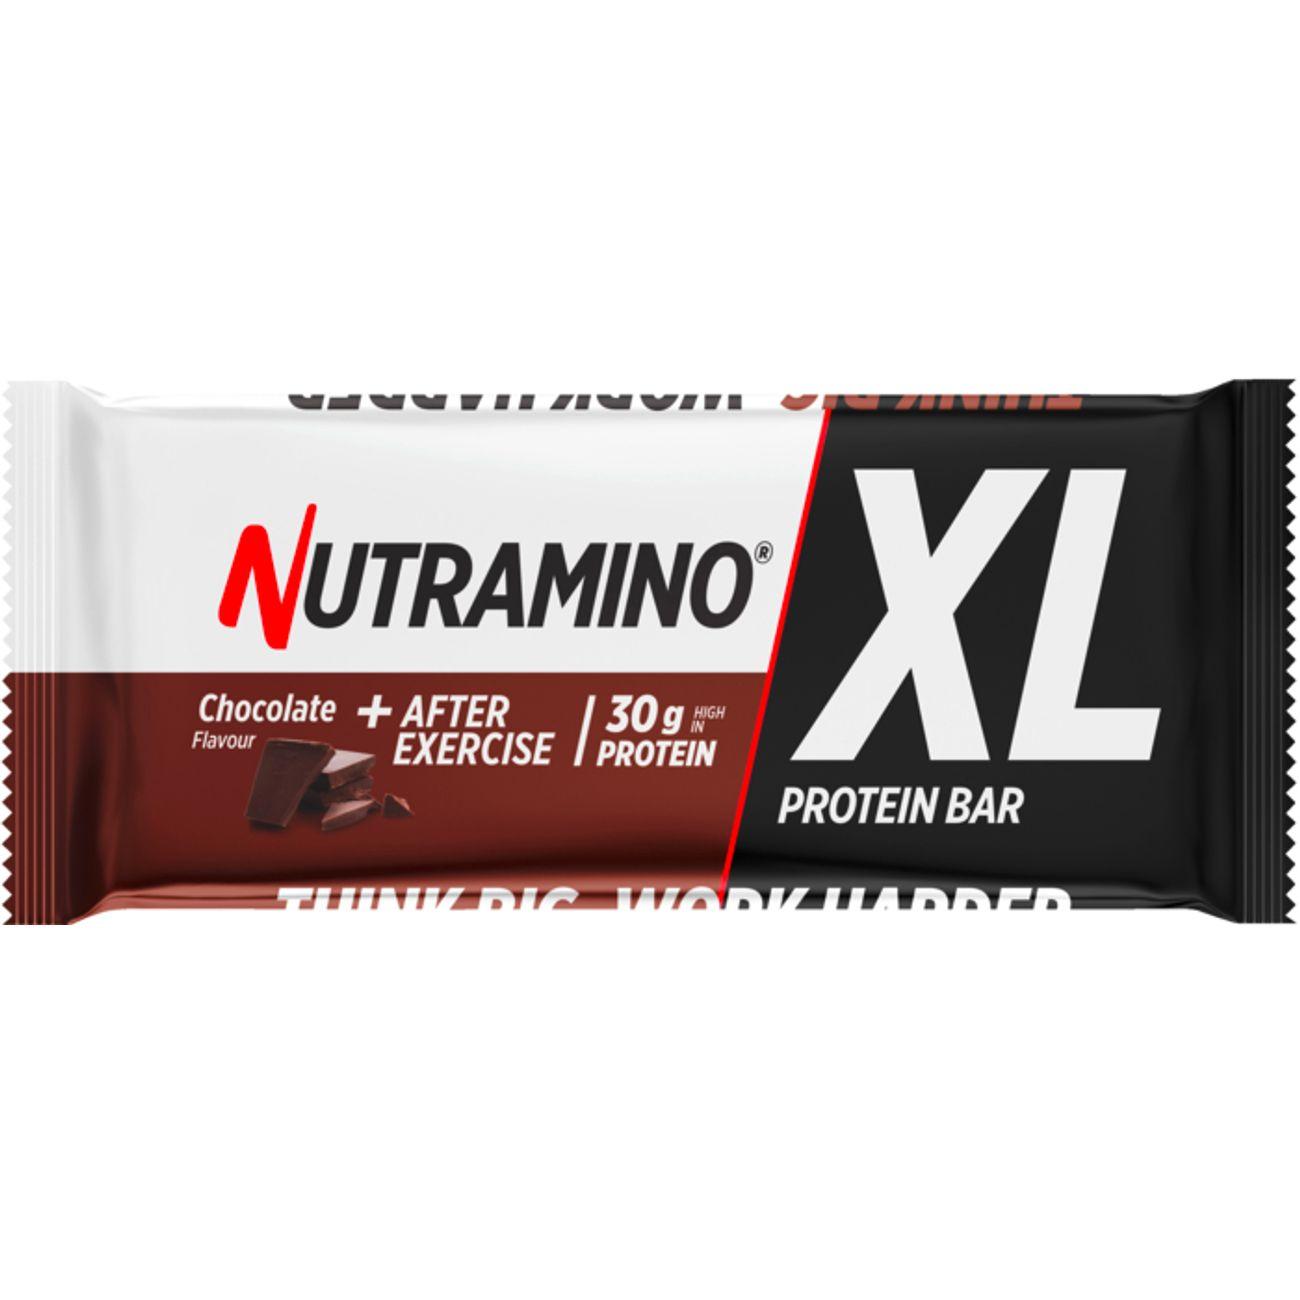 Barre protéinée Musculation mixte nutramino PROTEINBAR XL CHOC